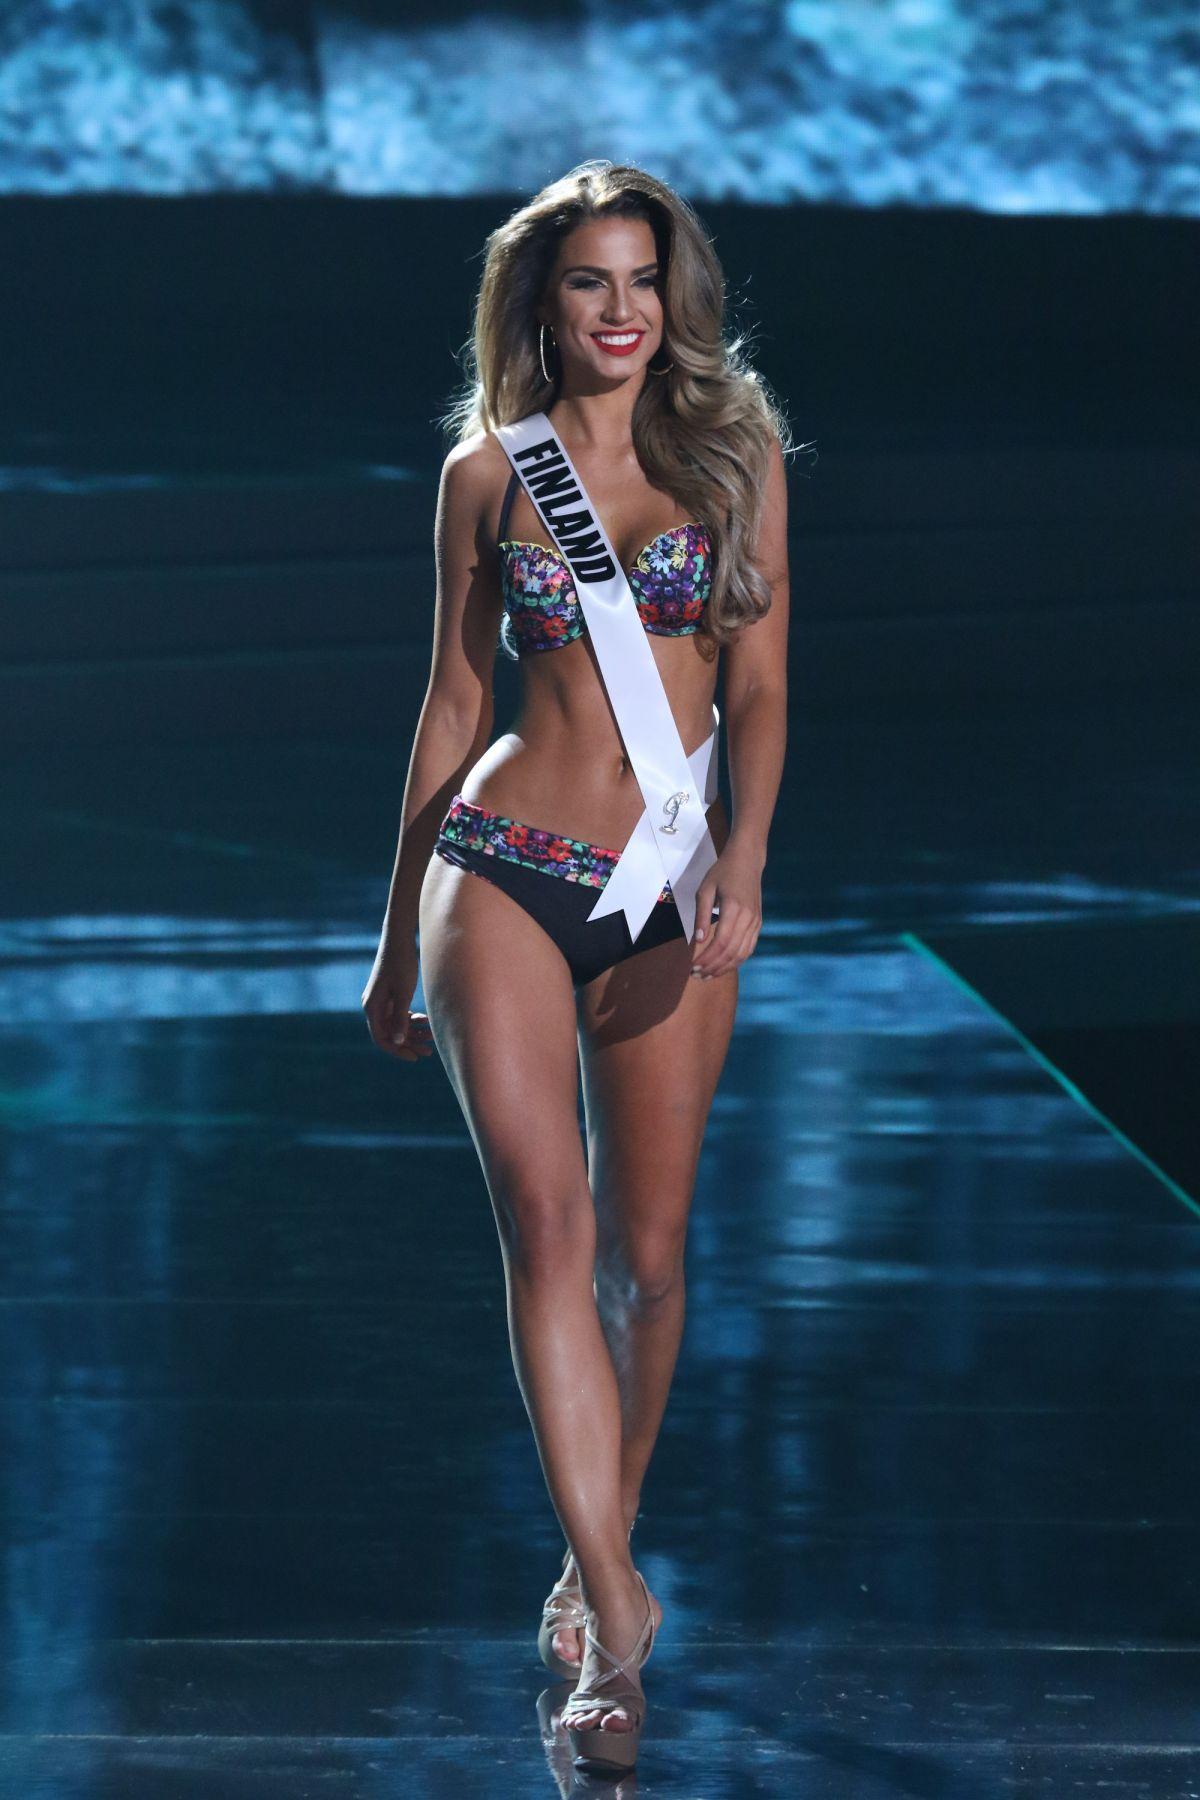 ROSA-MARIA RYYTI - Miss Universe 2015 Preliminary Round 12/16/2015